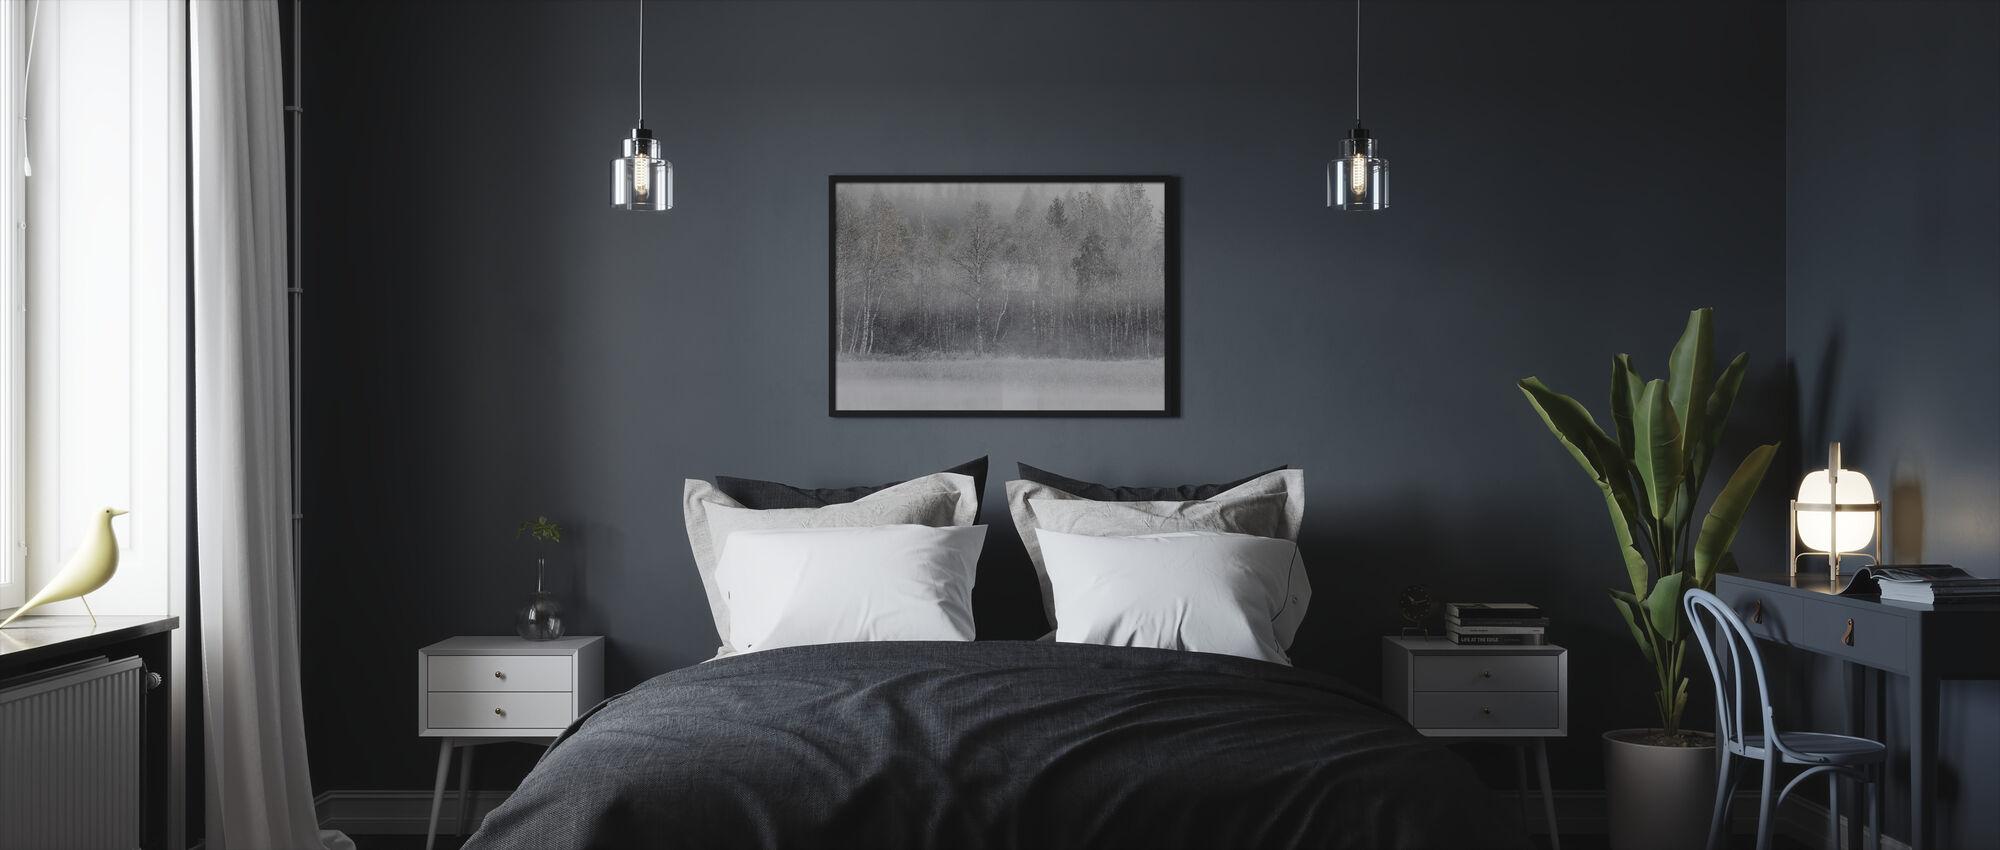 Mystery Trees - Framed print - Bedroom